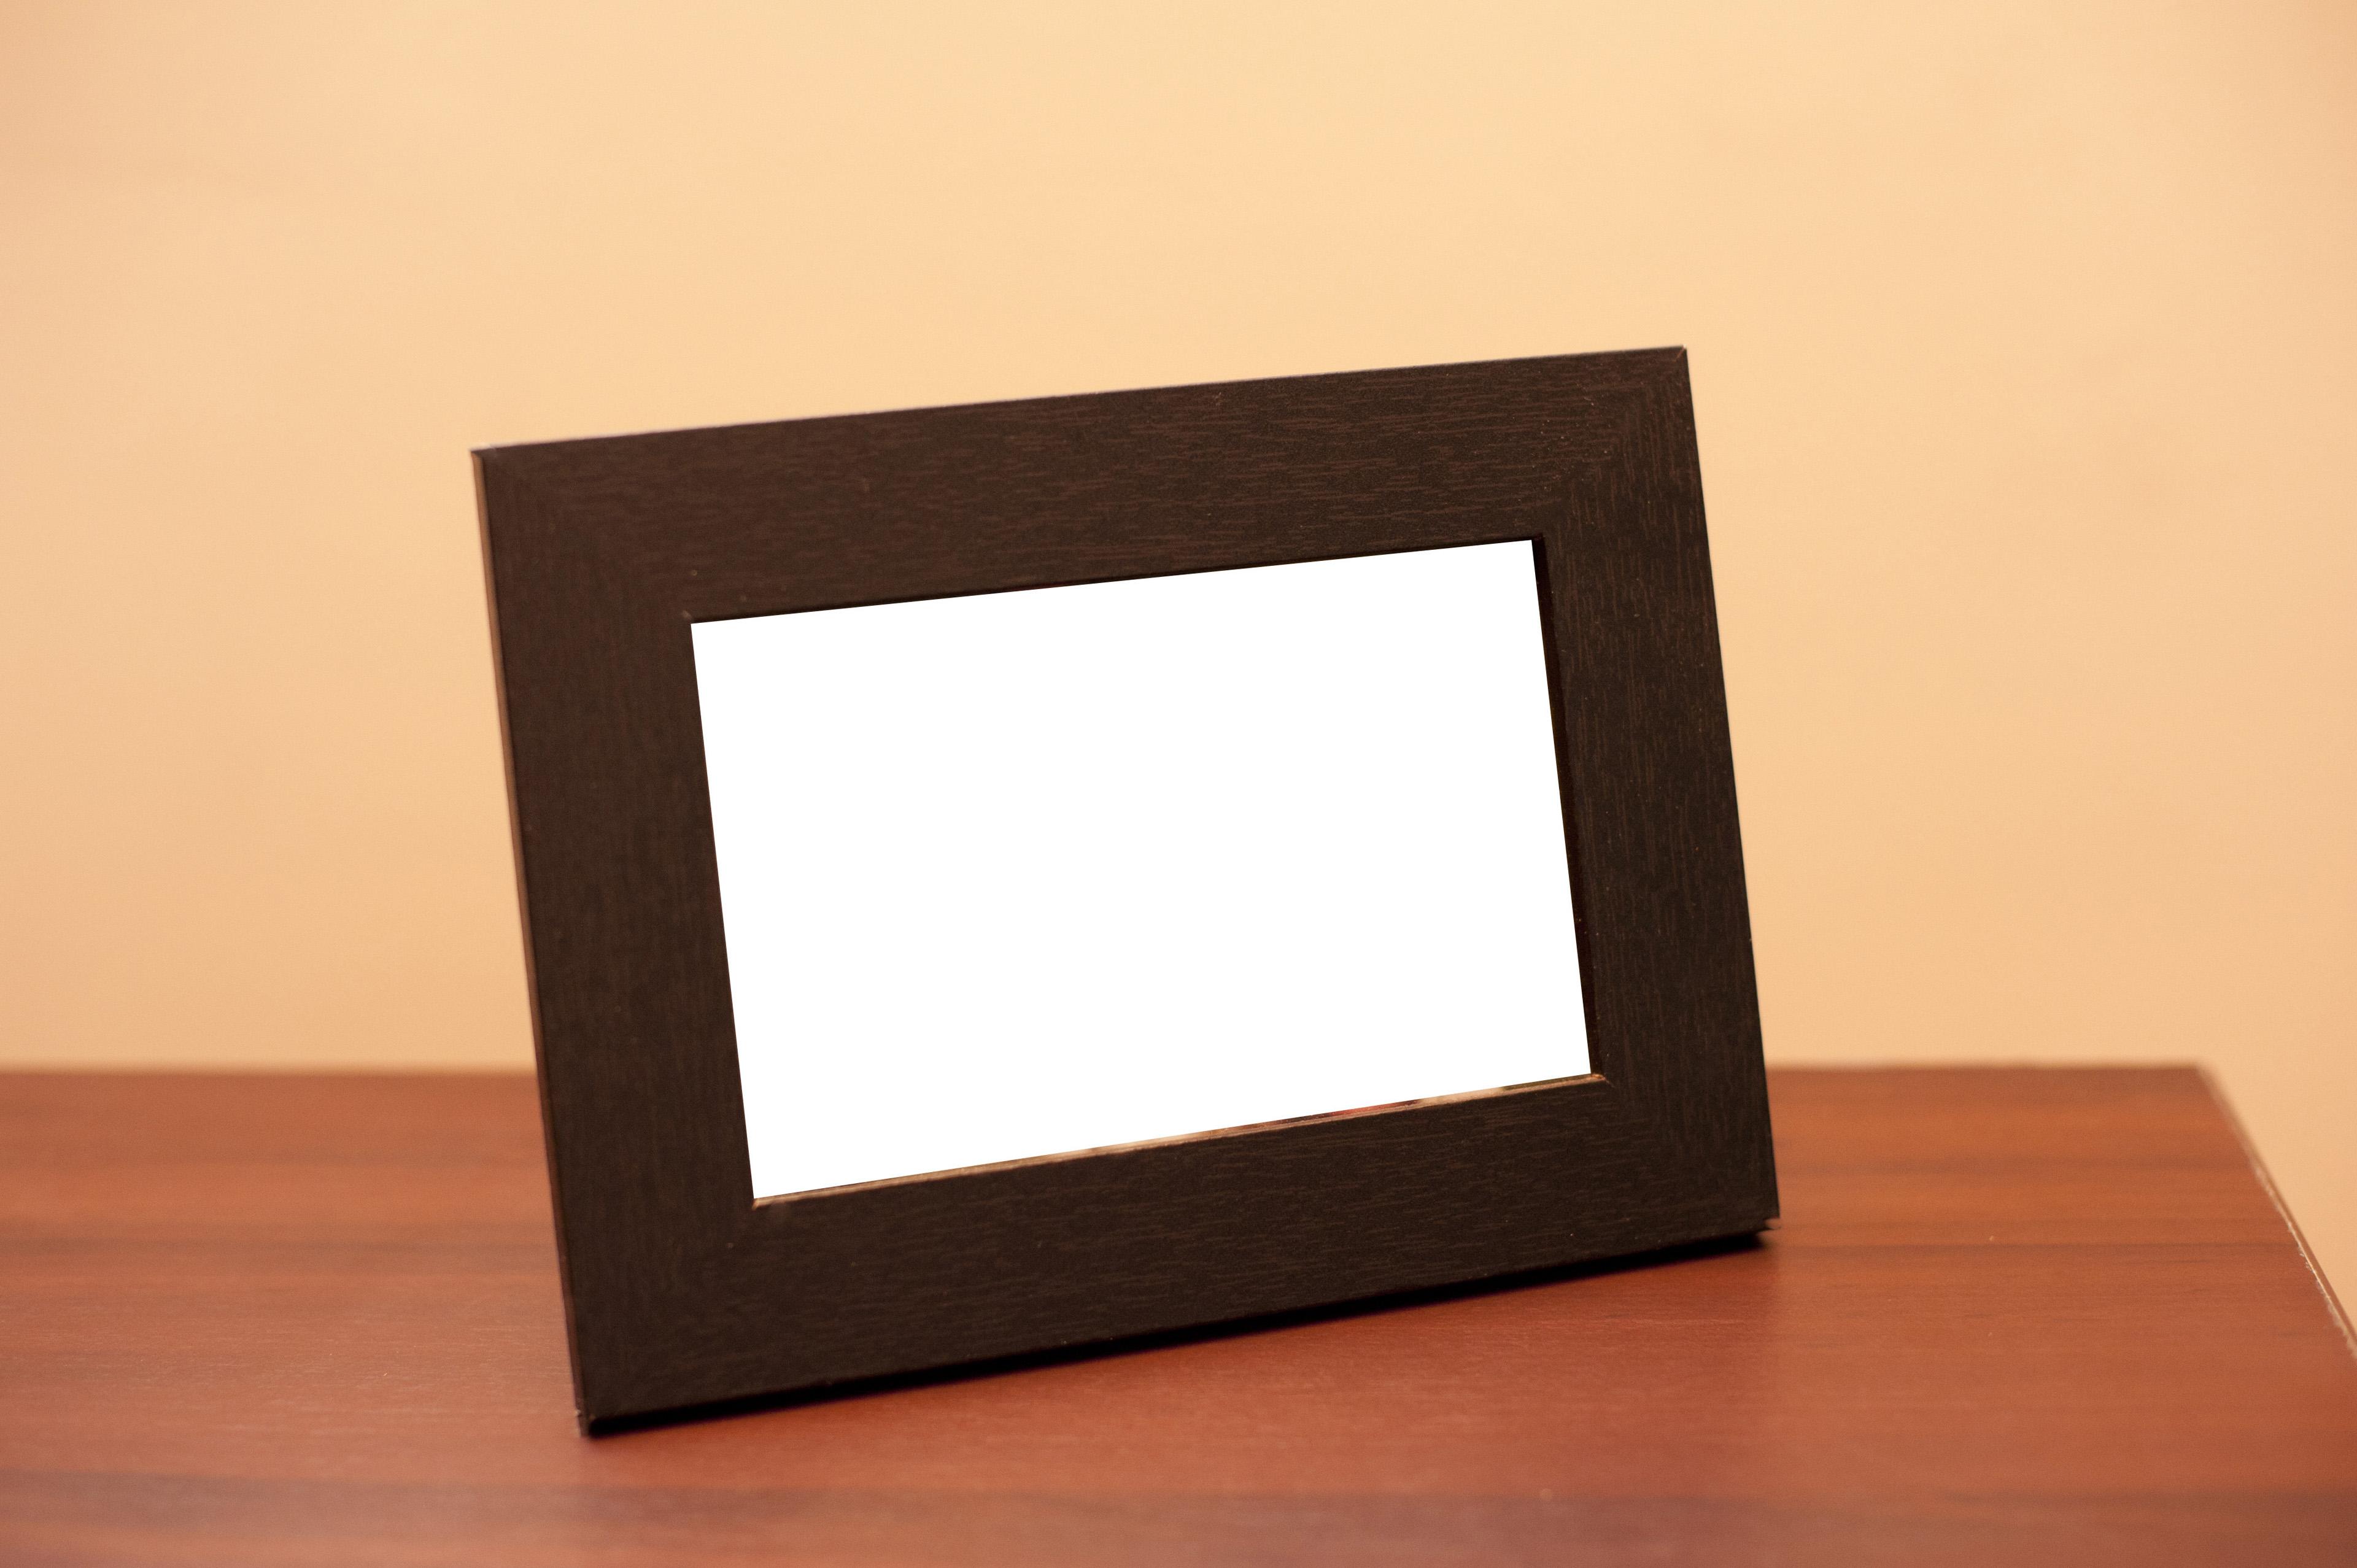 a frame photography | Framess.co